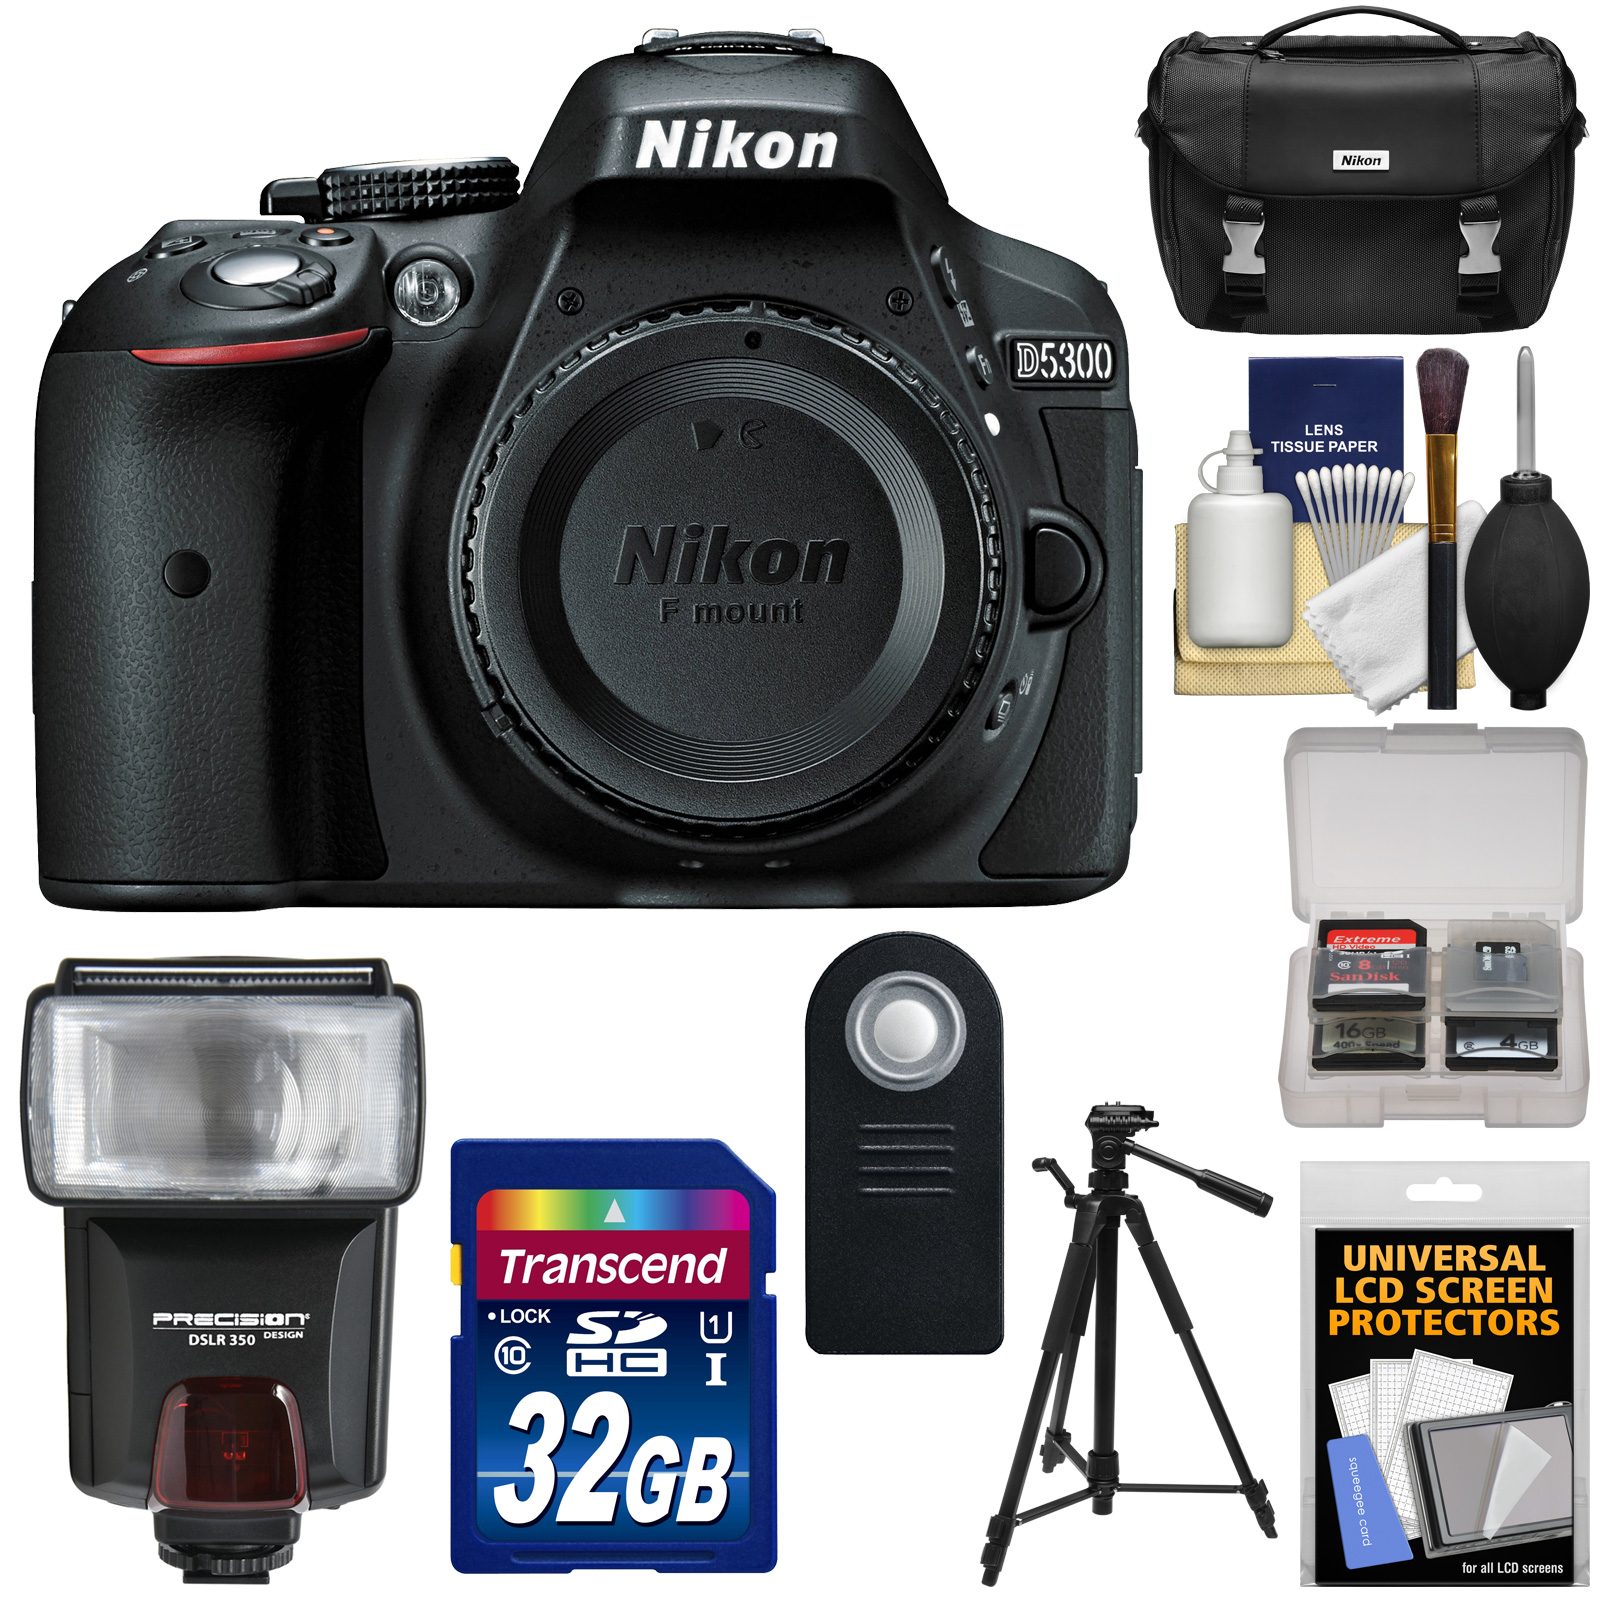 Nikon D5300 Digital SLR Camera Body (Black) - Factory Refurbished with 32GB Card + Case + Flash + Tripod + Remote + Kit